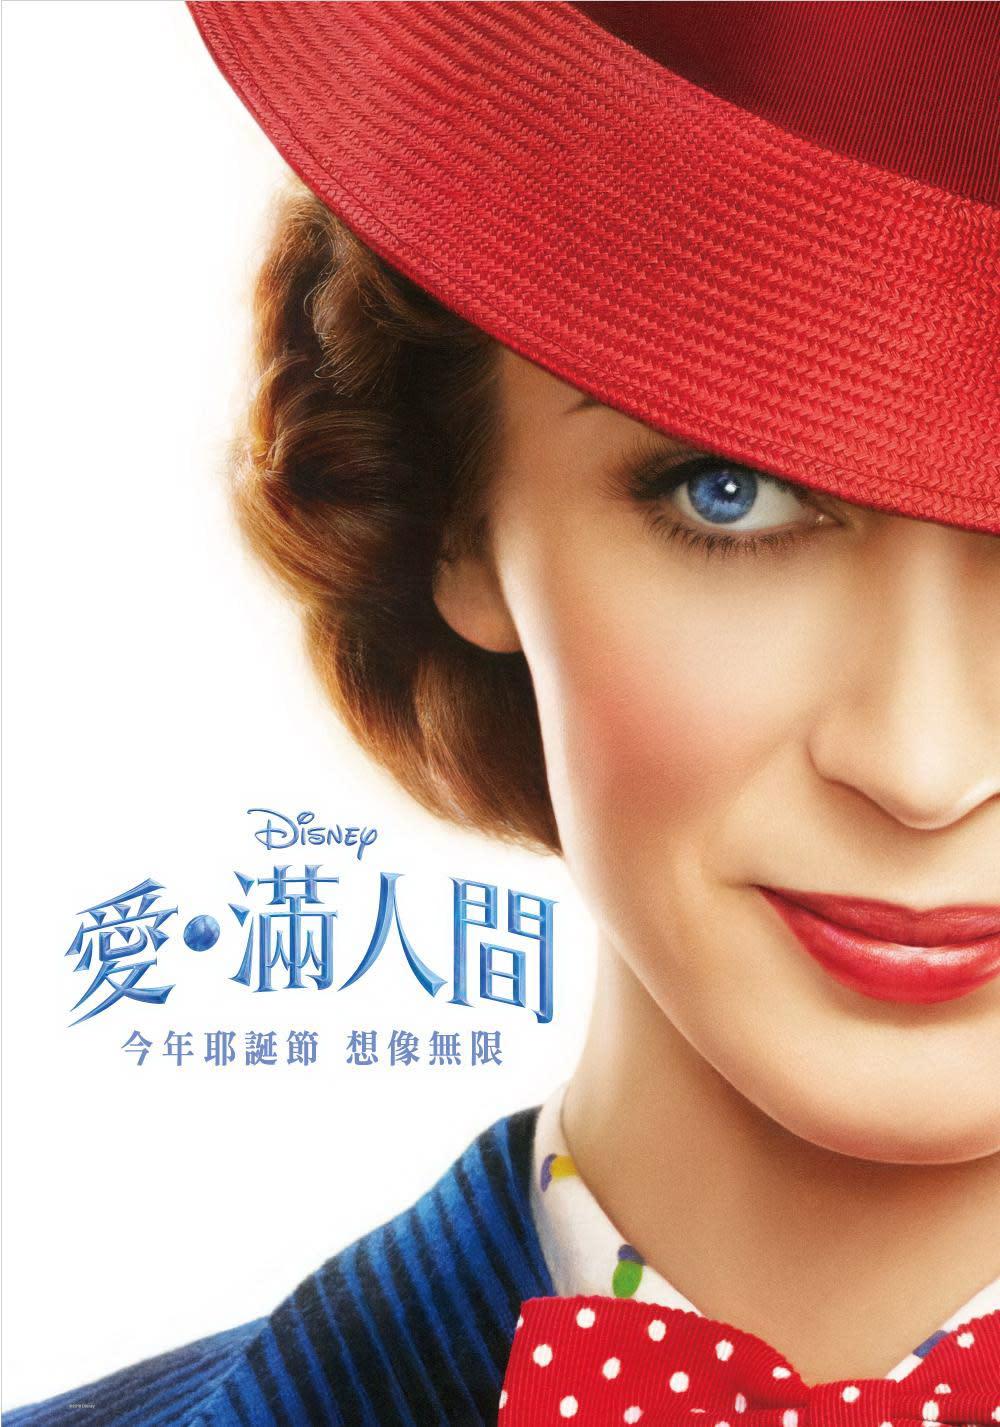 <p>Top 10、《愛.滿人間》:苦等了逾半世紀的經典續集,1964年由華特迪士尼製作發行的歌舞片《歡樂滿人間》,在當年一舉入圍十三項奧斯卡、並抱回其中五座大獎,成為迪士尼史上提名最多獎項的作品。這回邀得以《穿著Prada的惡魔》走紅、能演又能唱的英國女星艾蜜莉布朗,並與奧斯卡影后梅莉史翠普、影帝柯林佛斯、音樂才子林曼奴爾米蘭達攜手演出,甚至還請回了當年《歡樂滿人間》的男主角迪克凡戴克驚喜客串。《愛.滿人間》重新詮釋了這部充滿奇幻與童趣的作品,再現動人魔法和溫暖情節的銀幕魅力。(圖:Yahoo電影) </p>